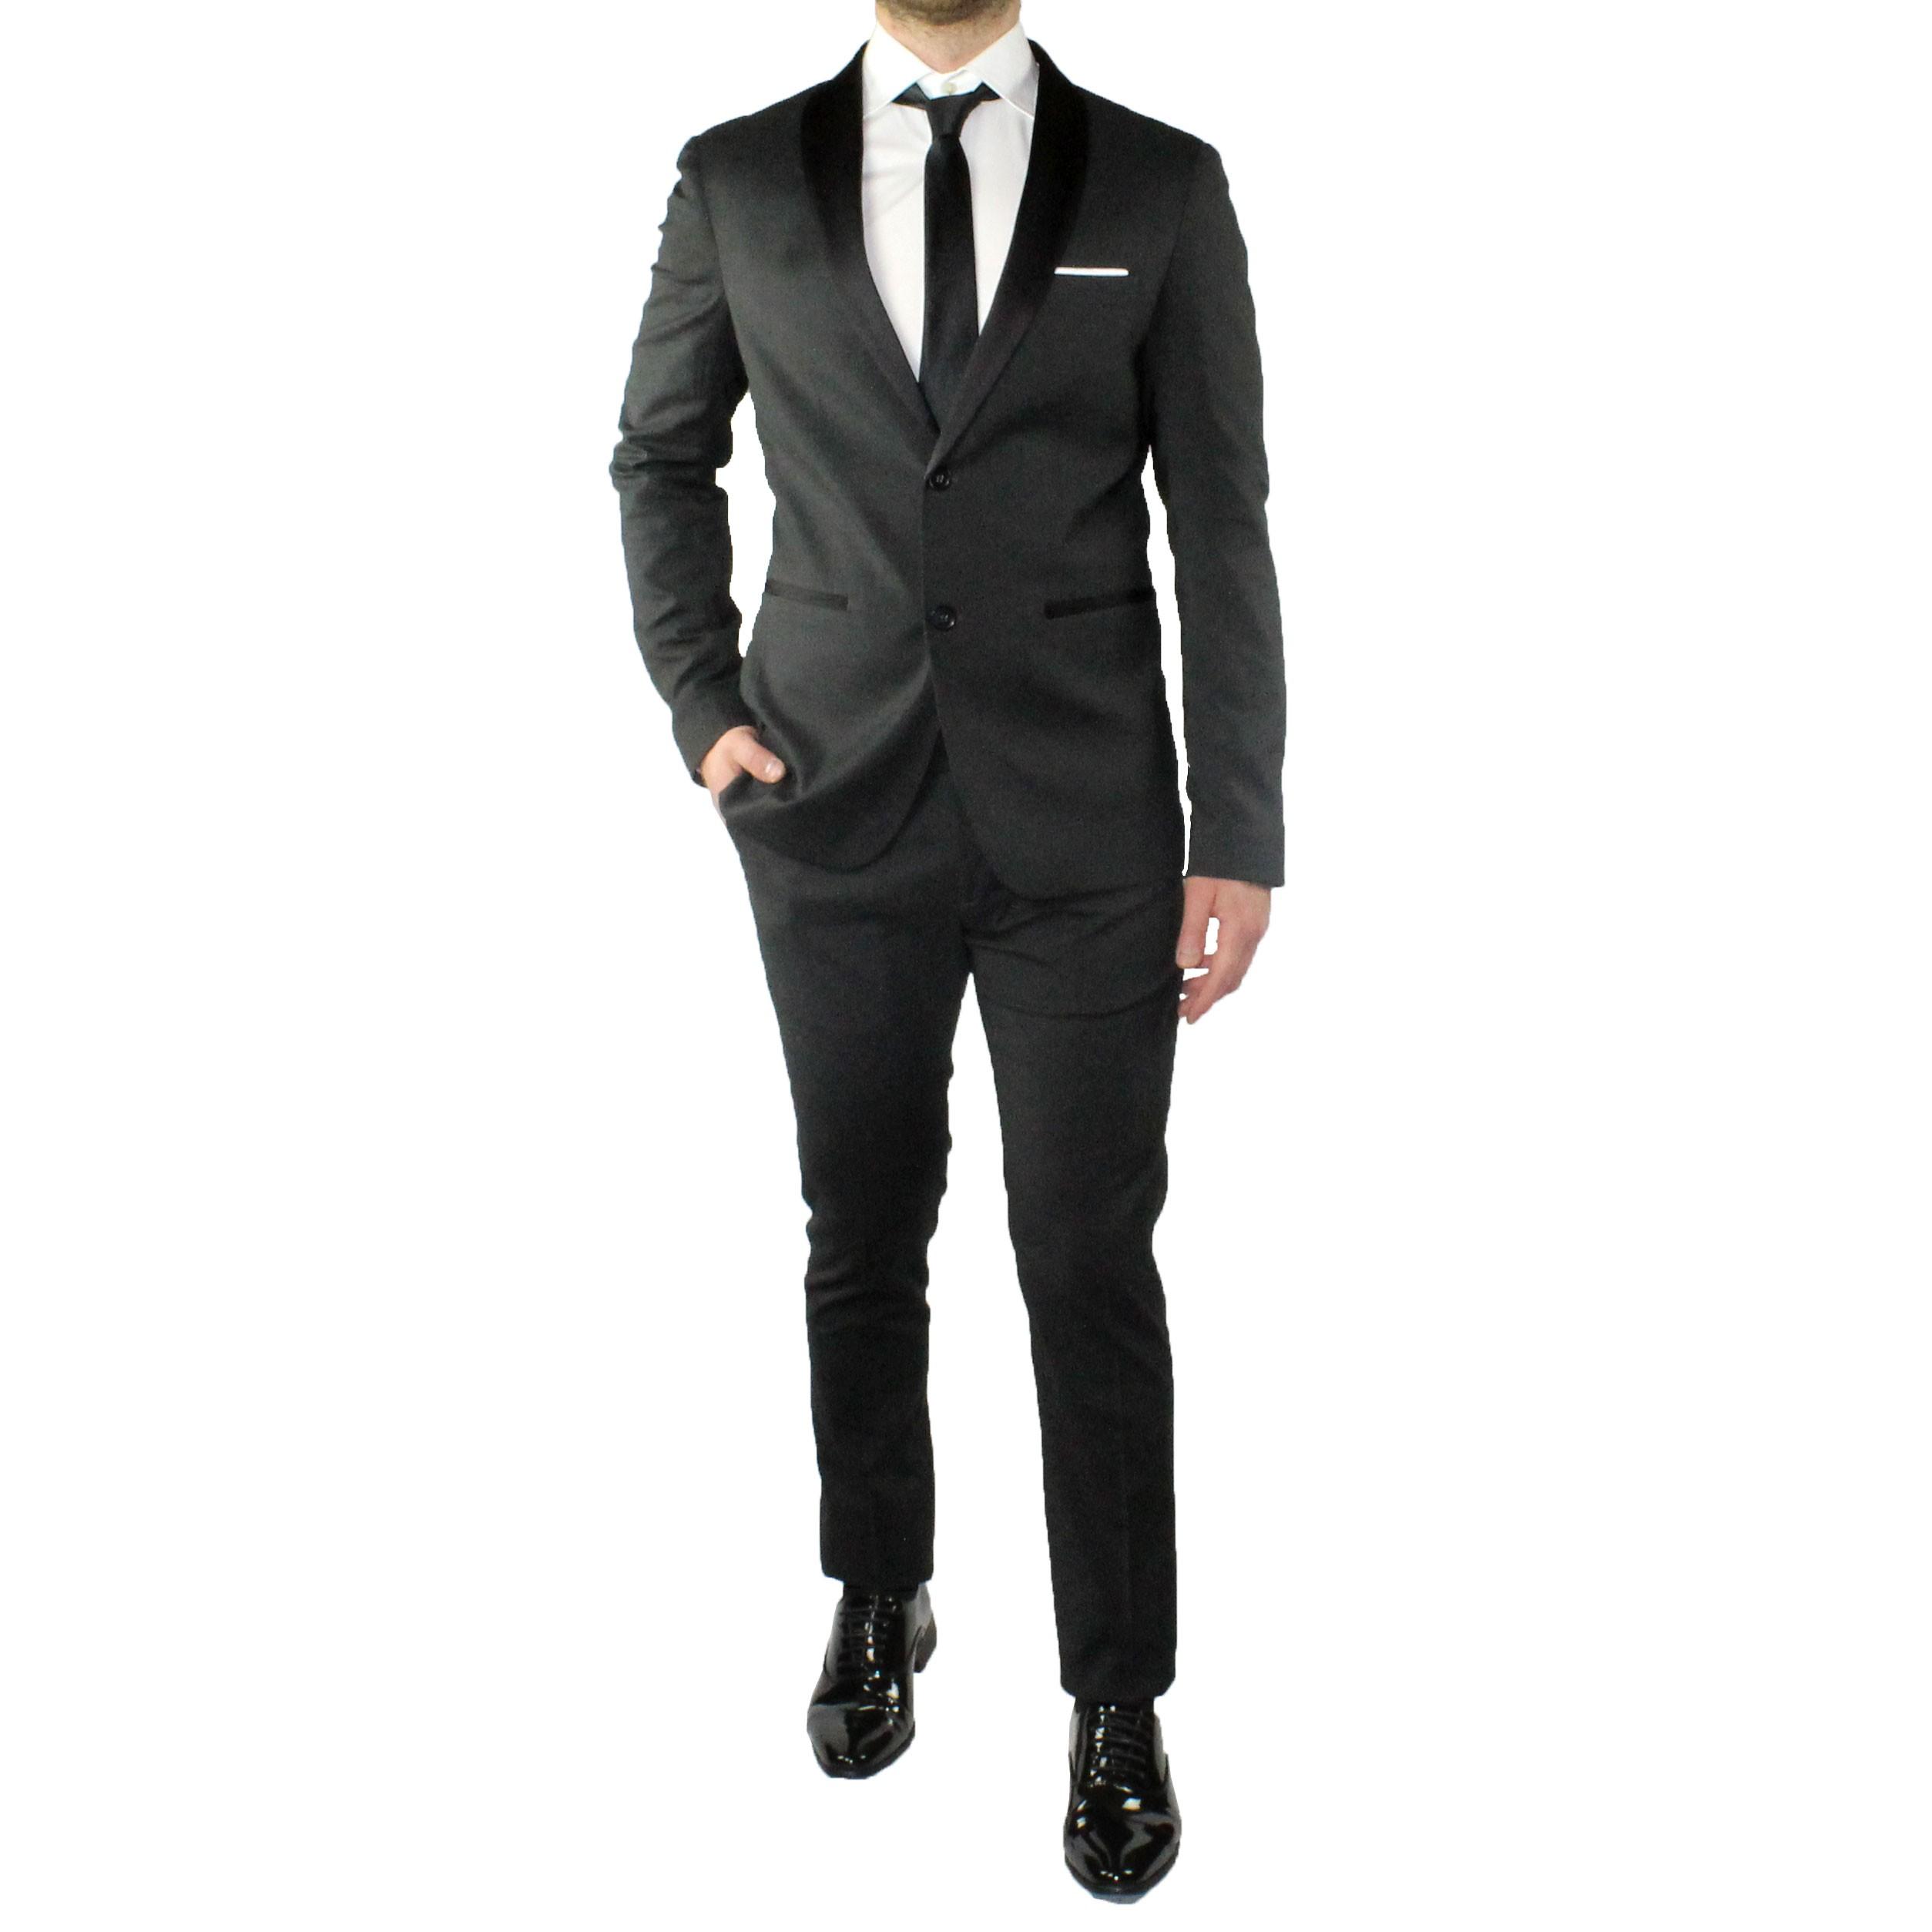 Abito-Uomo-Smoking-Elegante-Vestito-Completo-Estivo-Cerimonia-Sartoriale-Slim miniatura 11